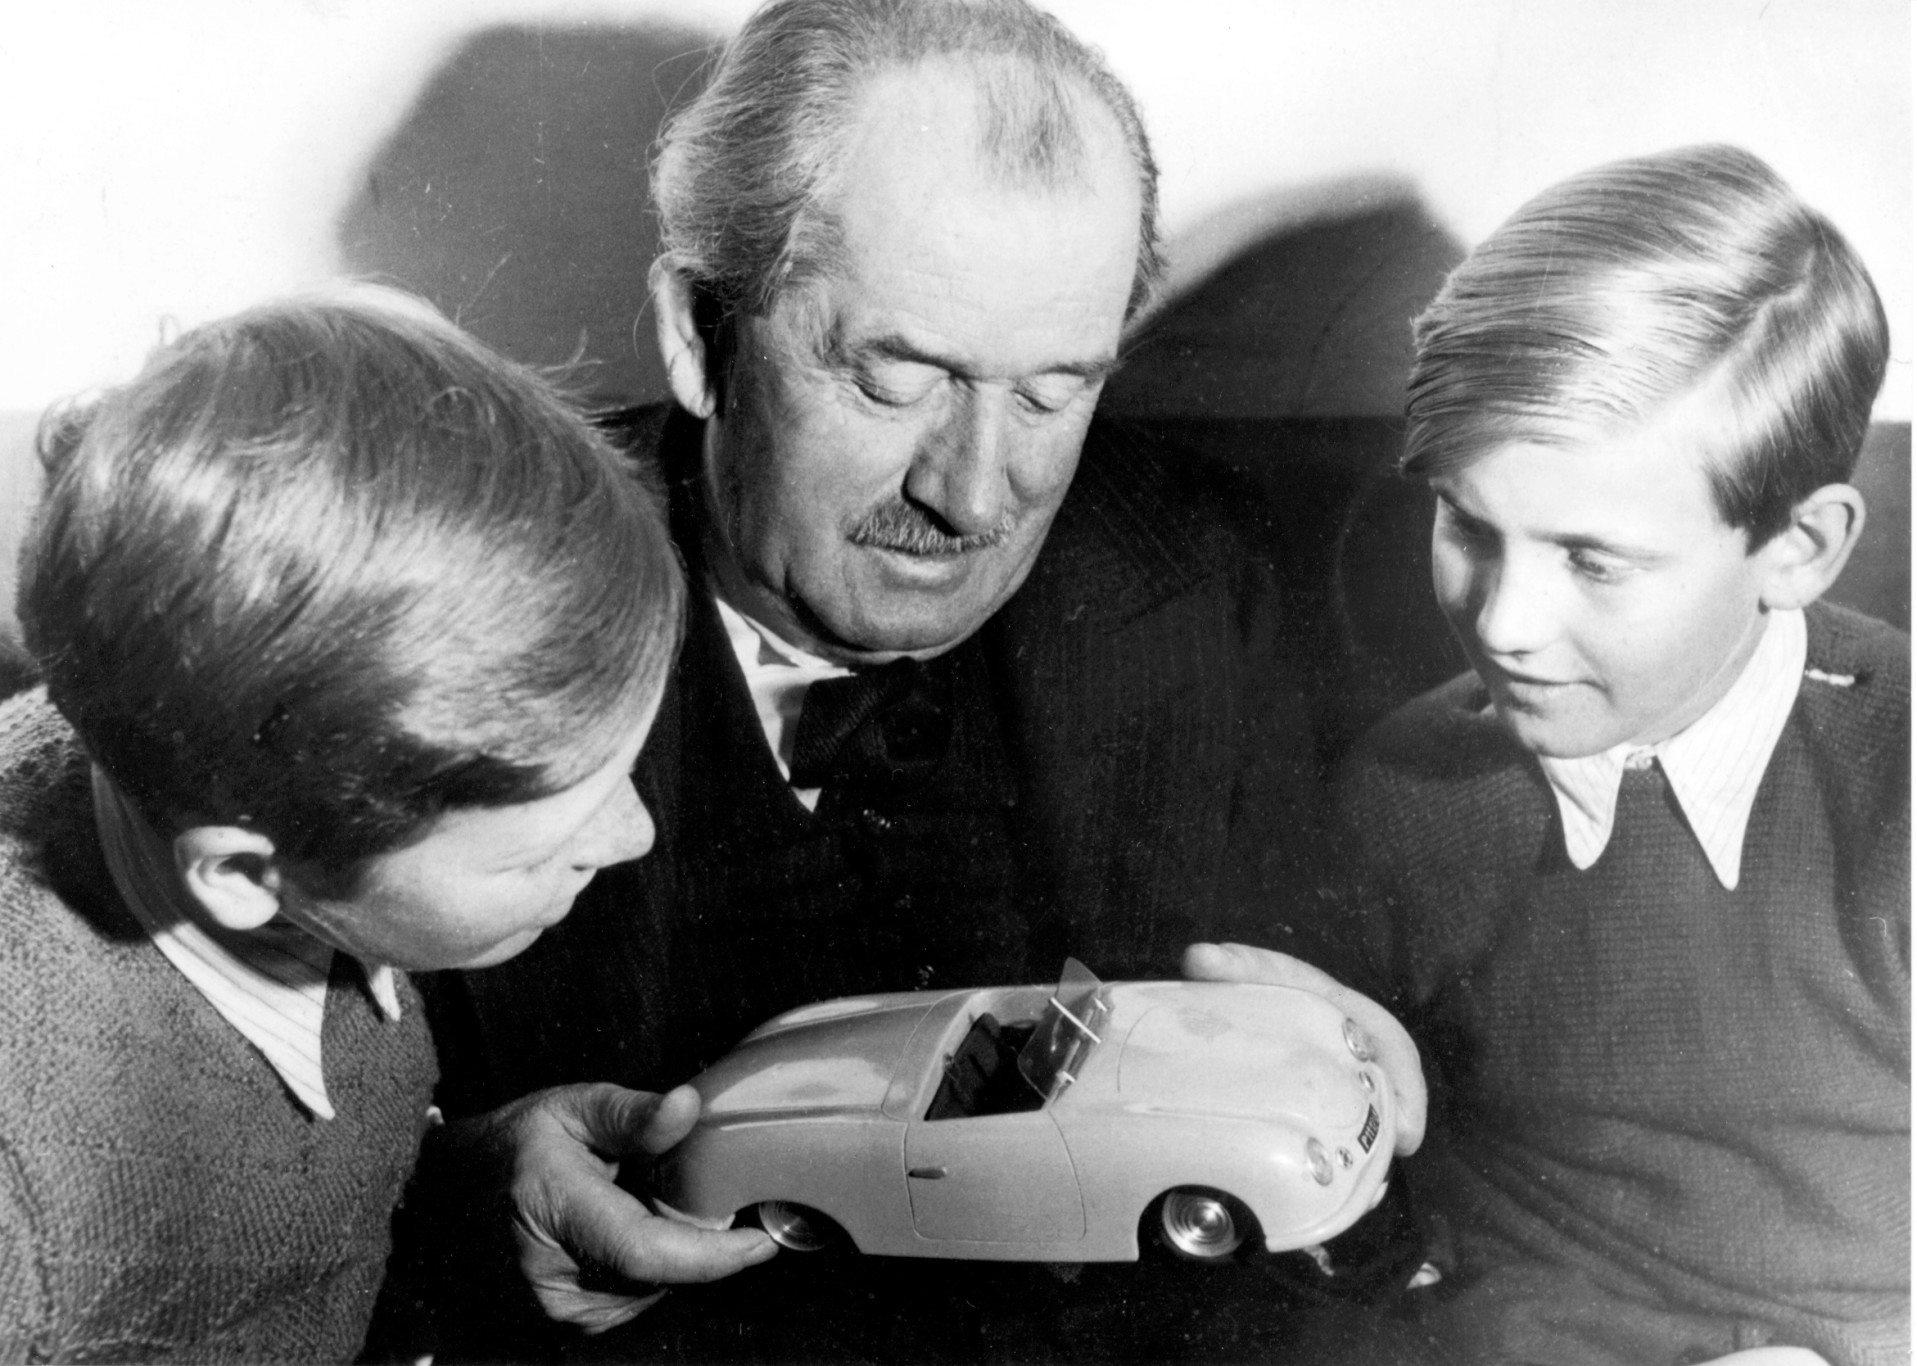 Ferdinand Porsche with two of his grandchildren